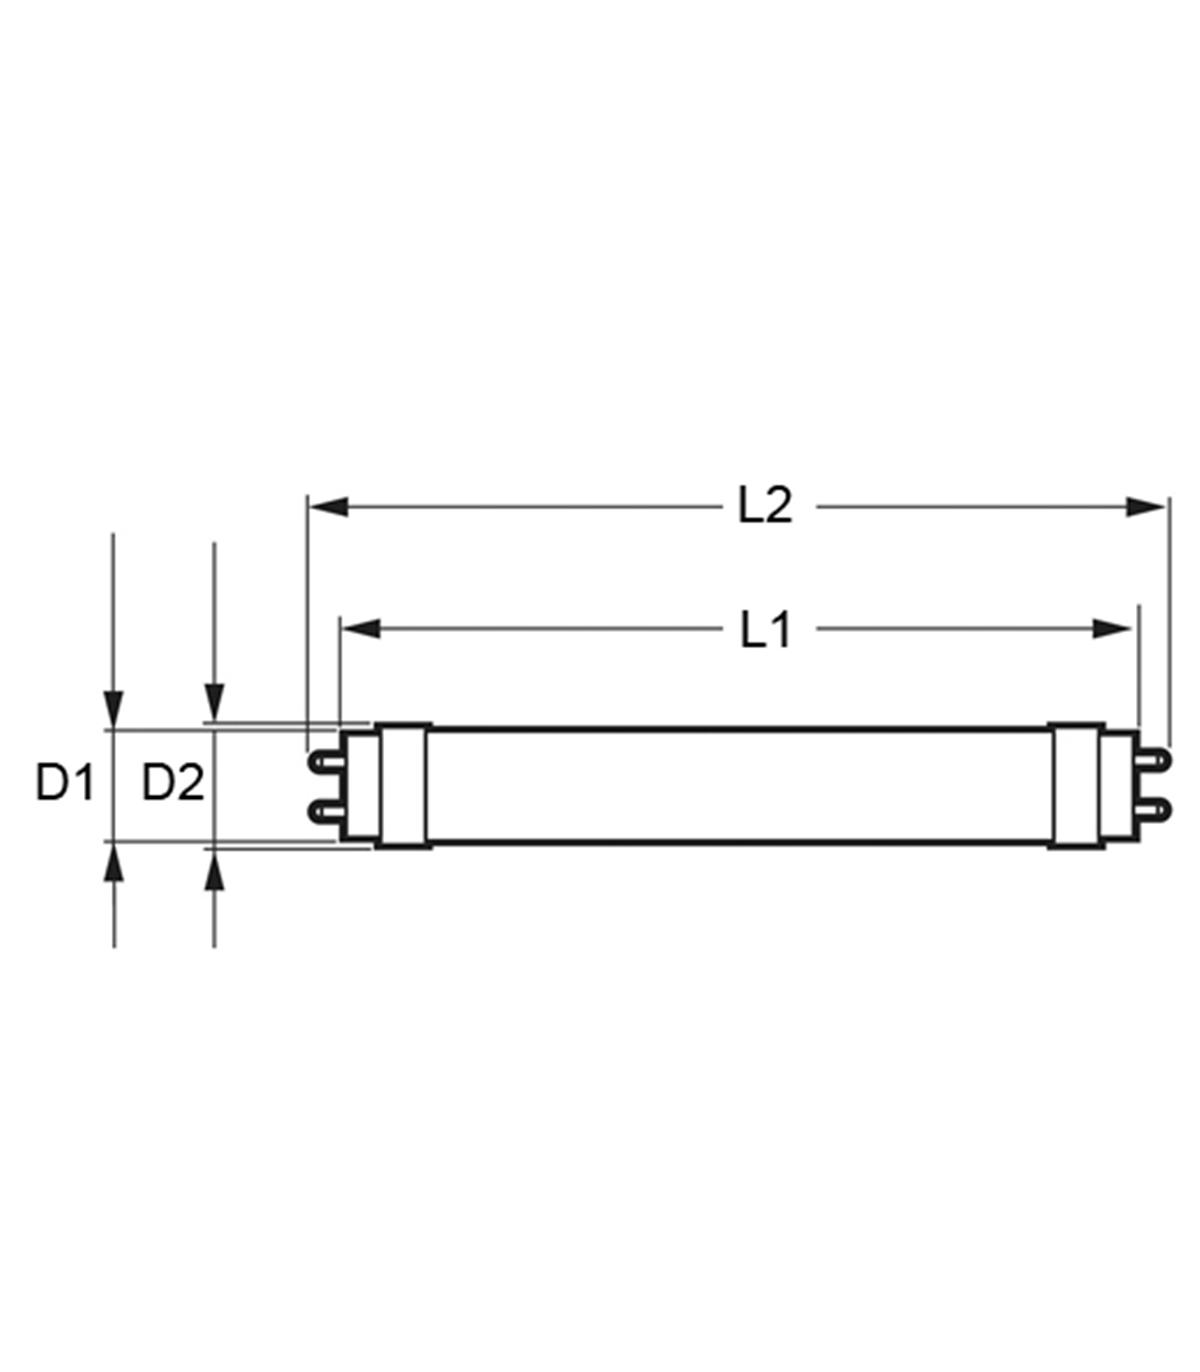 lampada led t8 14w branco frio vidro - 90cm - electricidade e